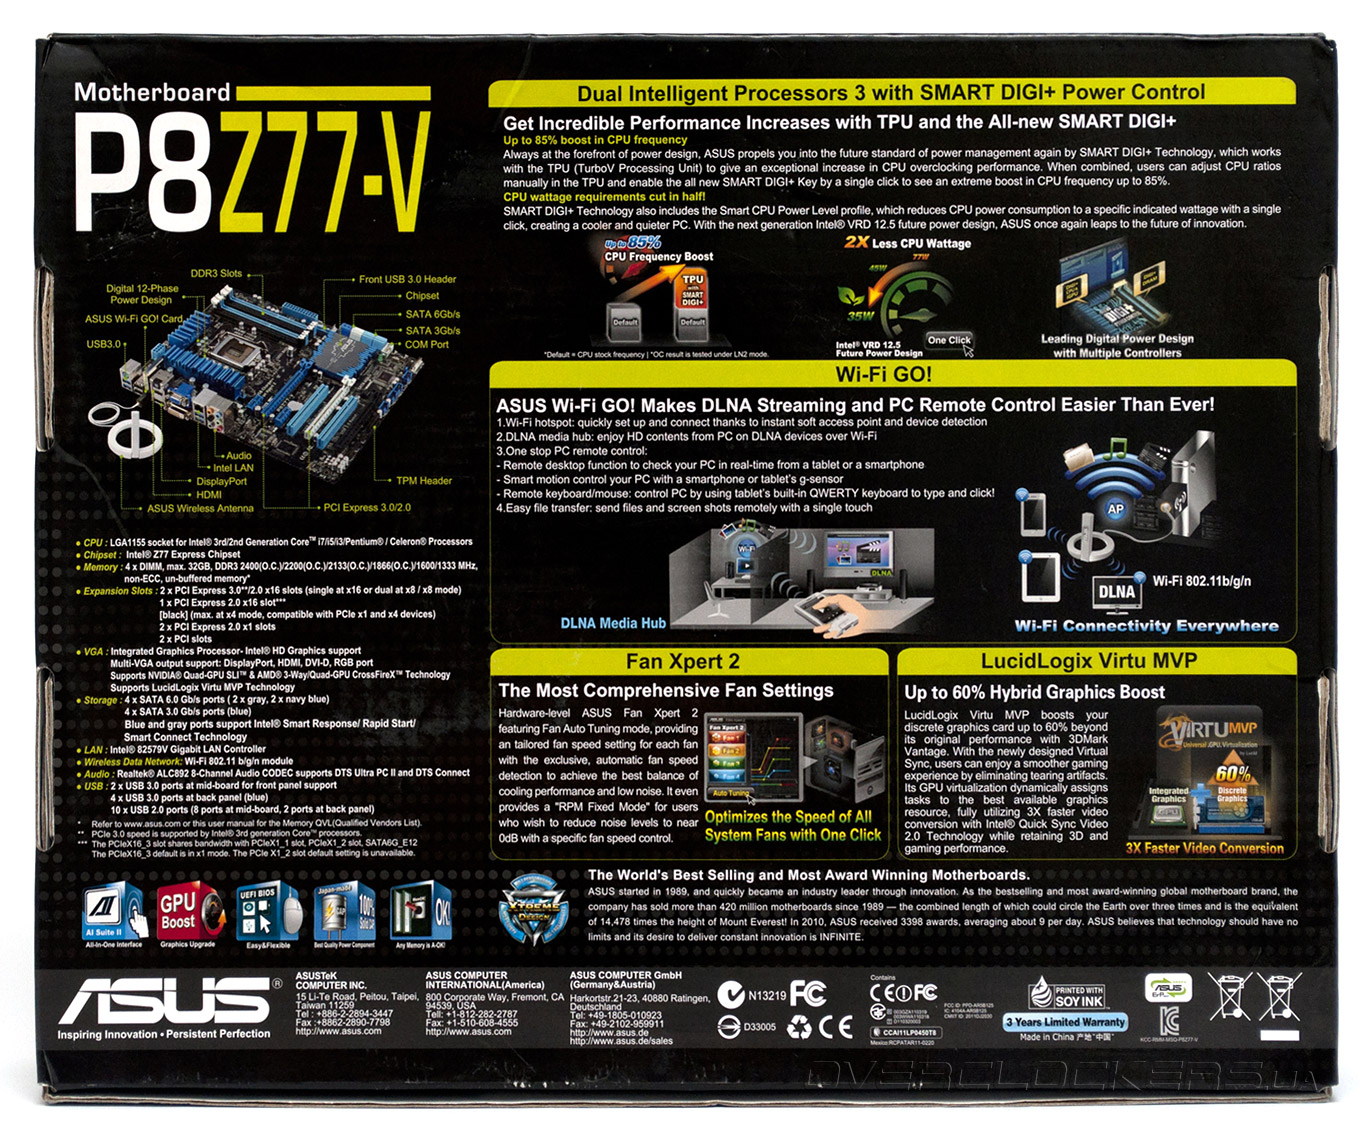 ASUS P8Z77-V LK FAN XPERT 2 TELECHARGER PILOTE